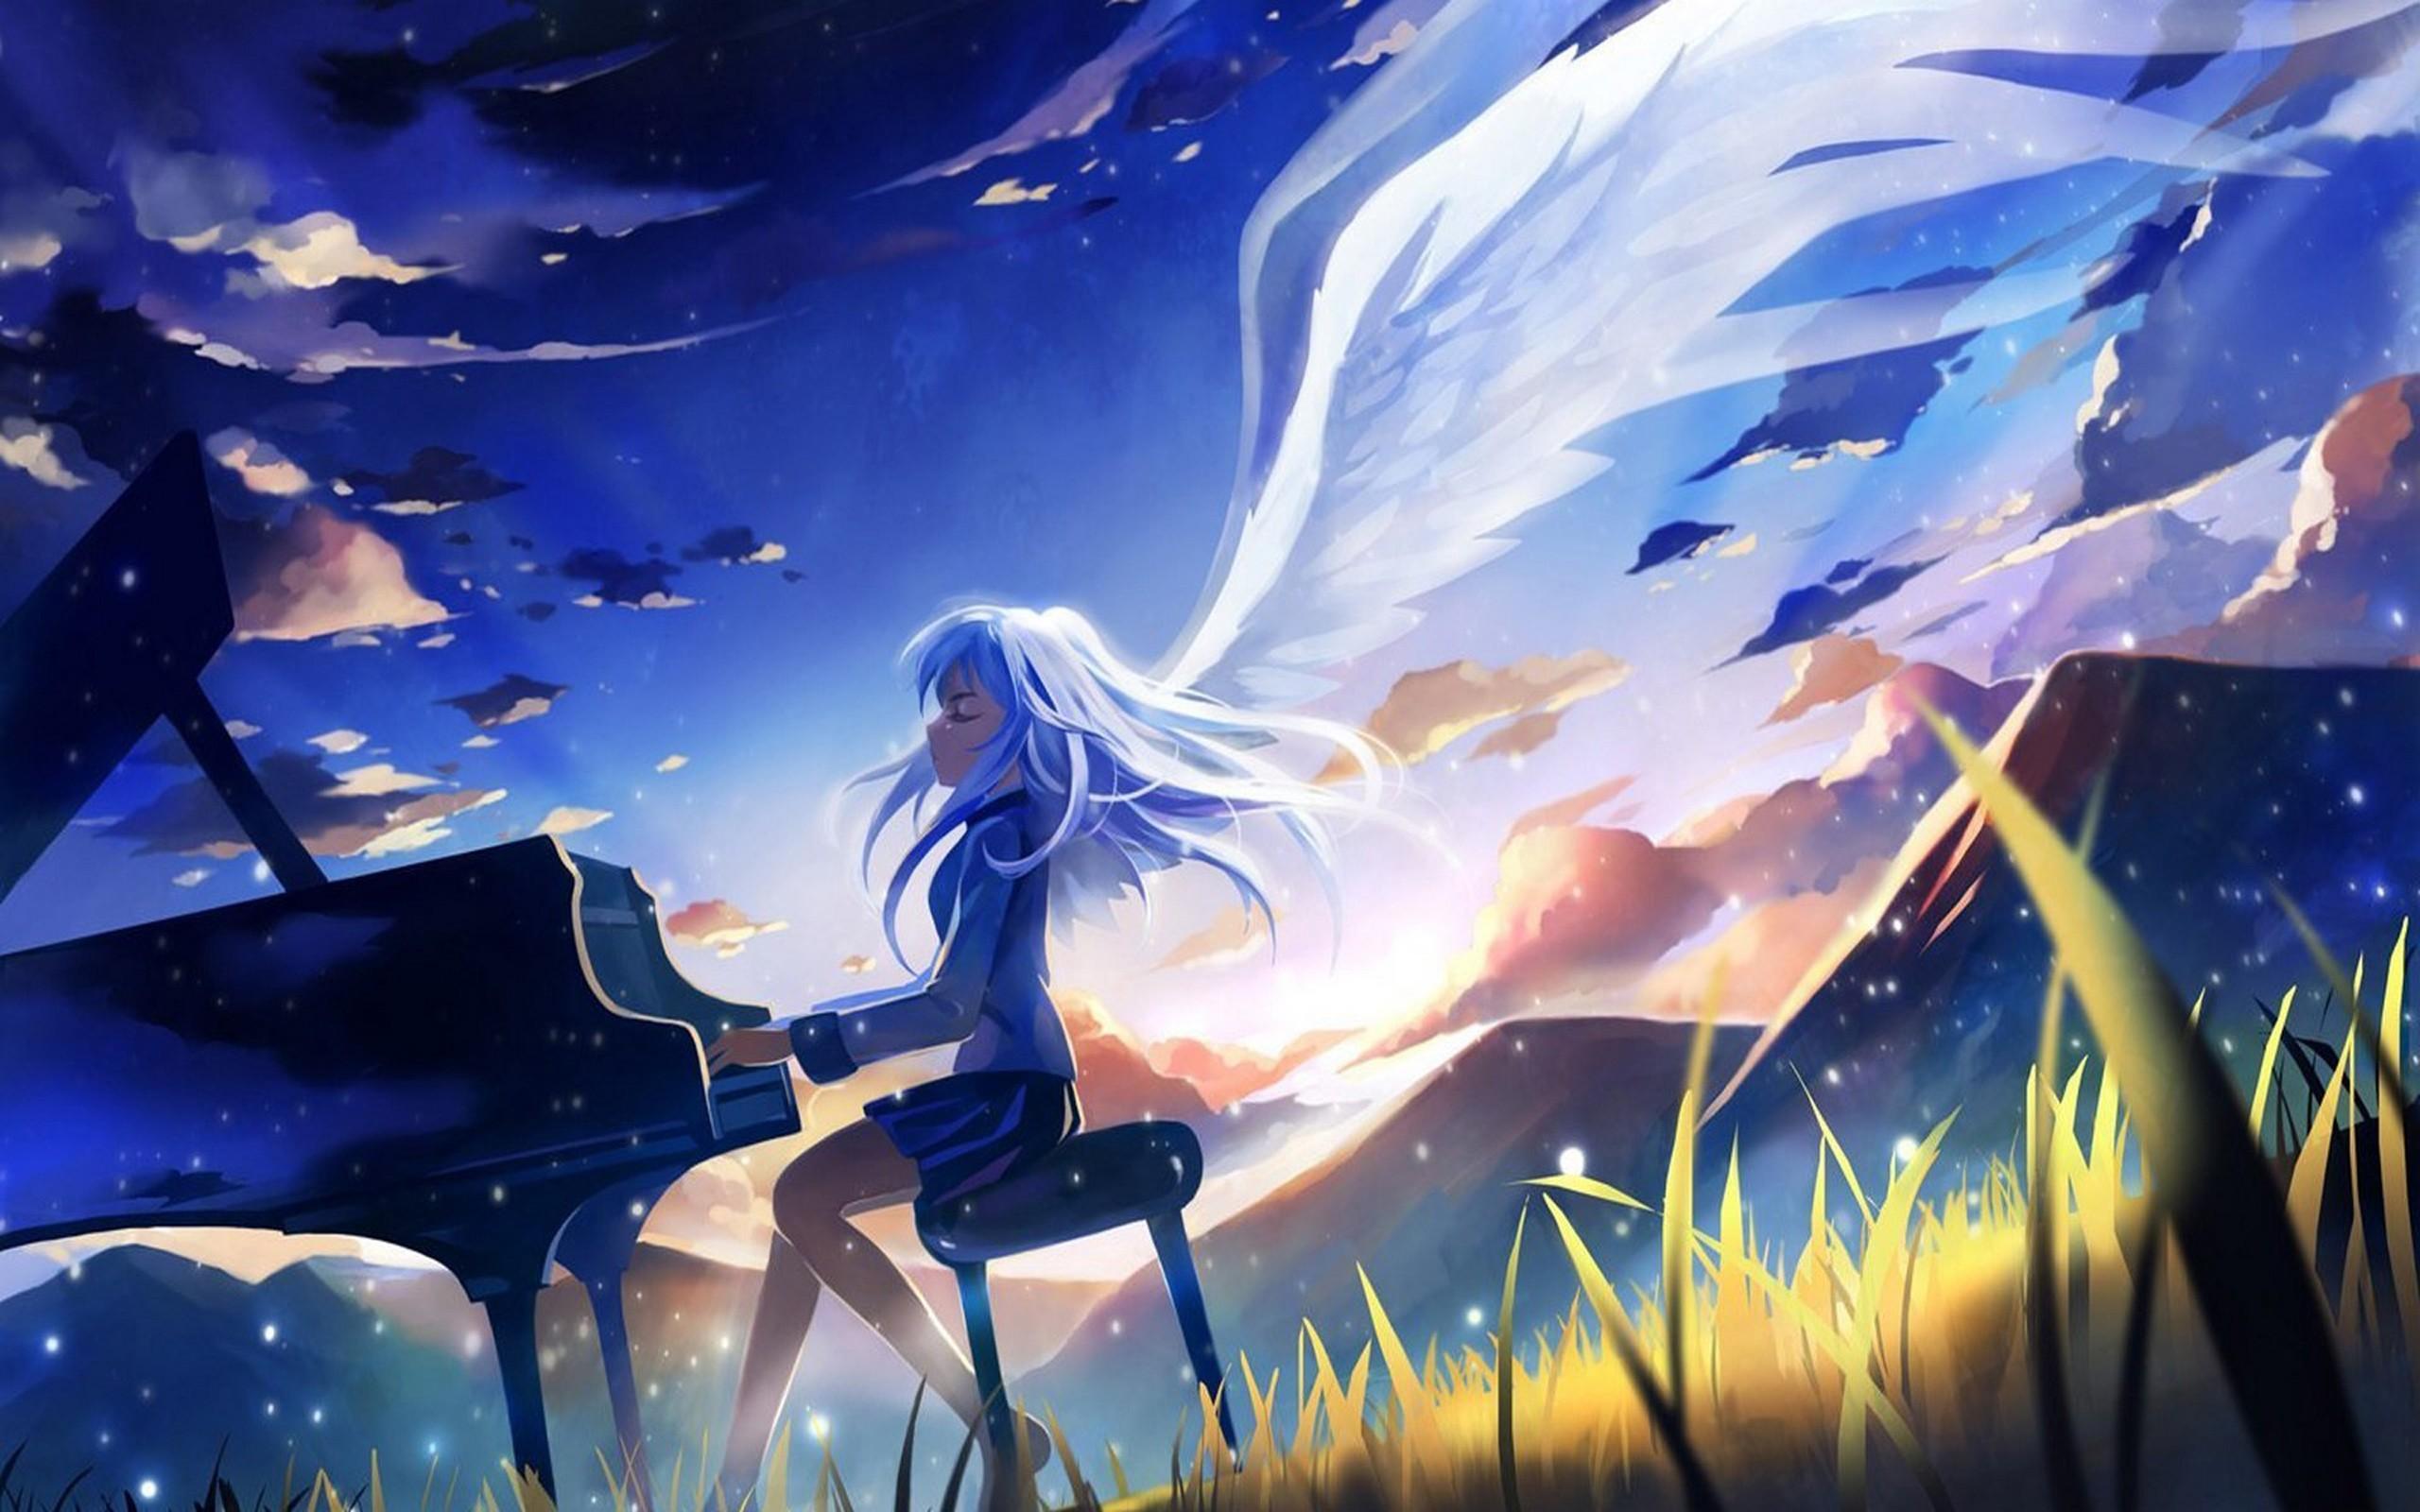 Angel Beats Wallpaper 1 Download Free Amazing Full HD Wallpapers